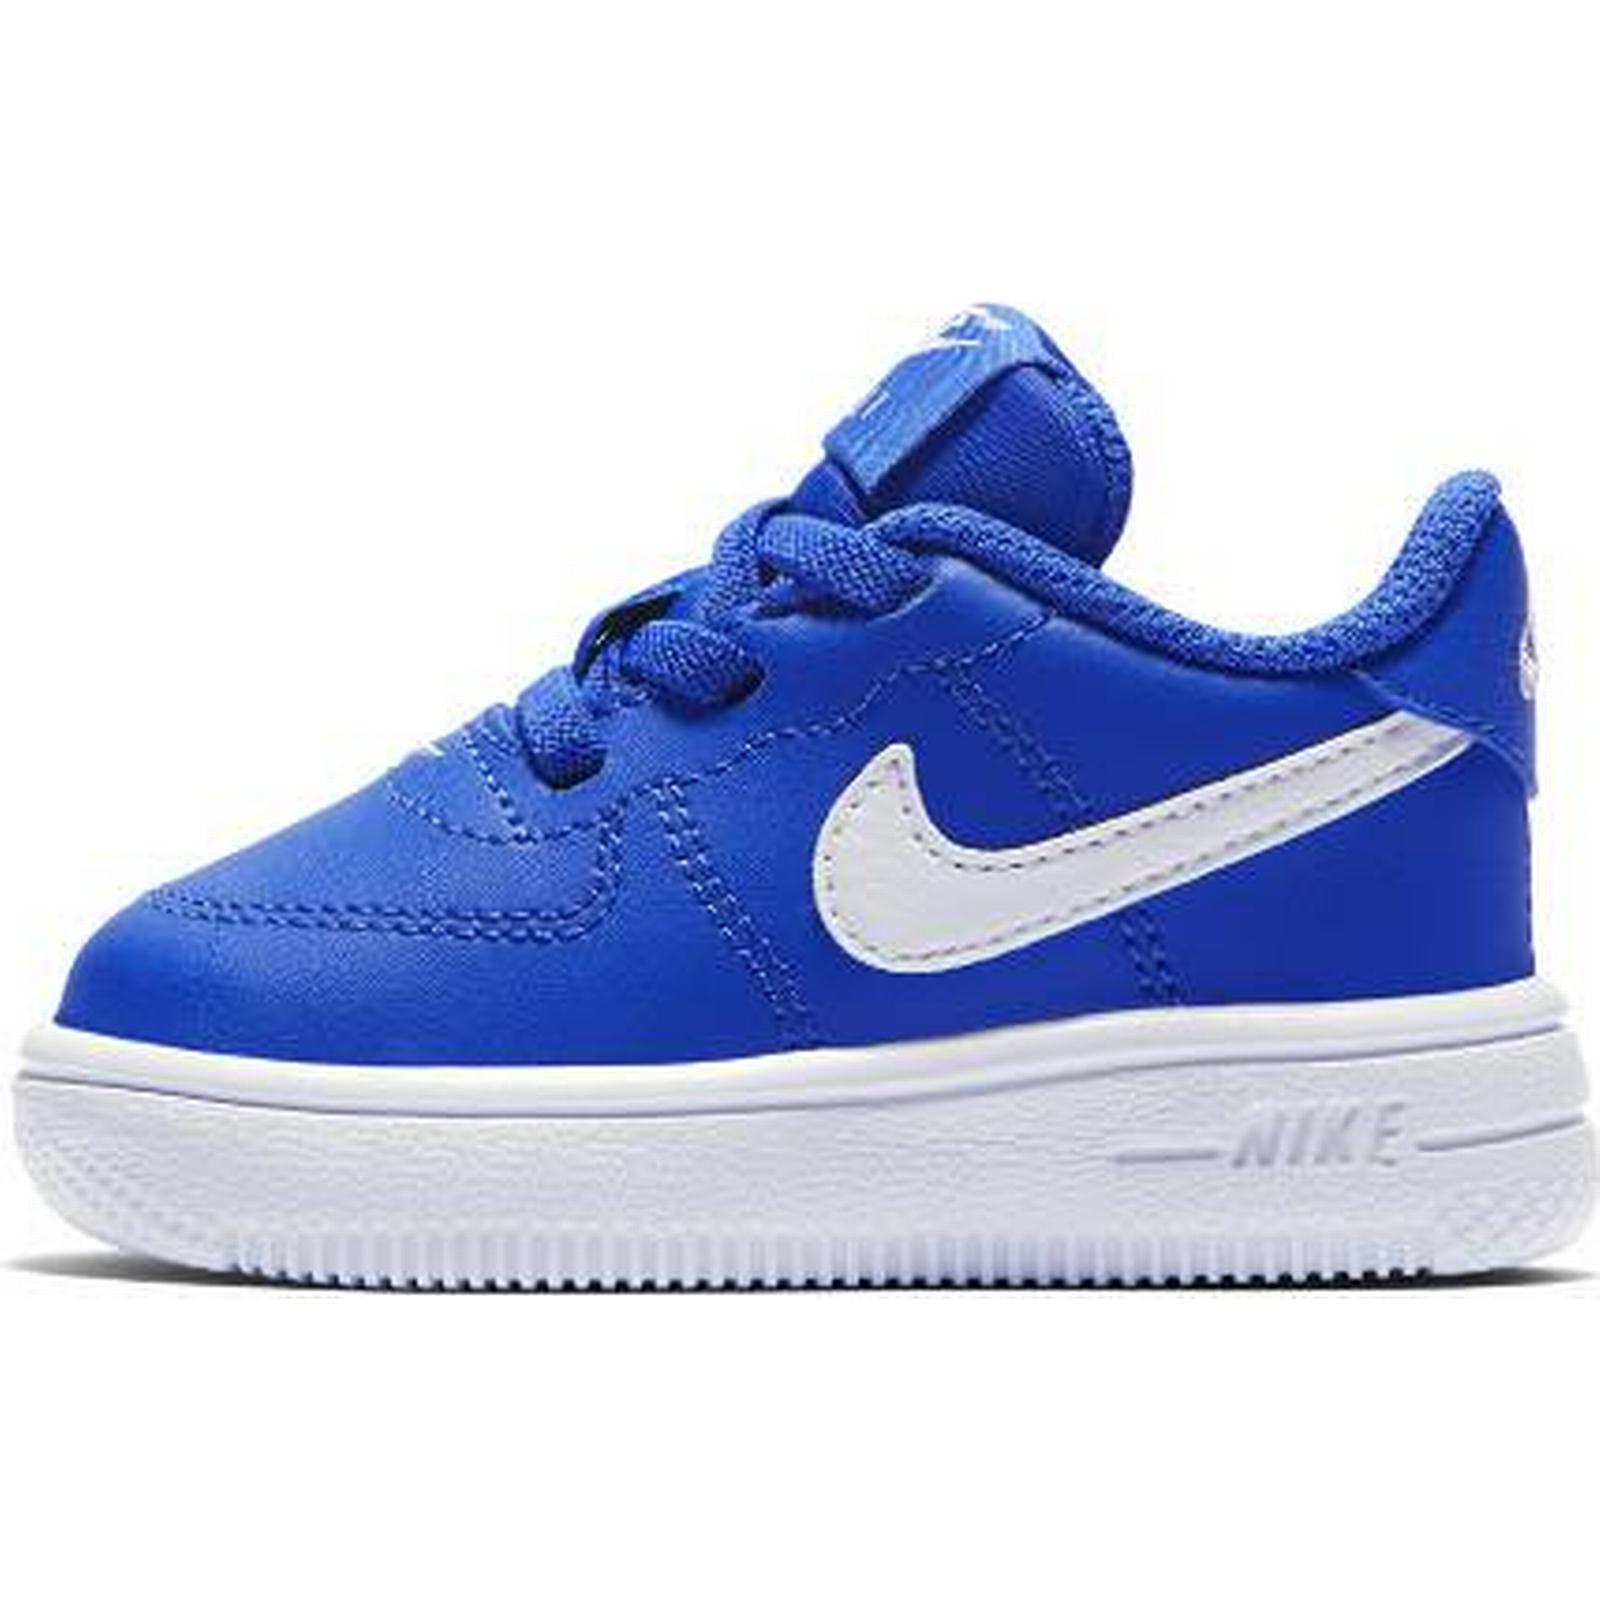 Men's/Women's : NIKE Buty Dla Maluchów Nike Air Sale Force 1 : Clearance Sale Air ff18c5